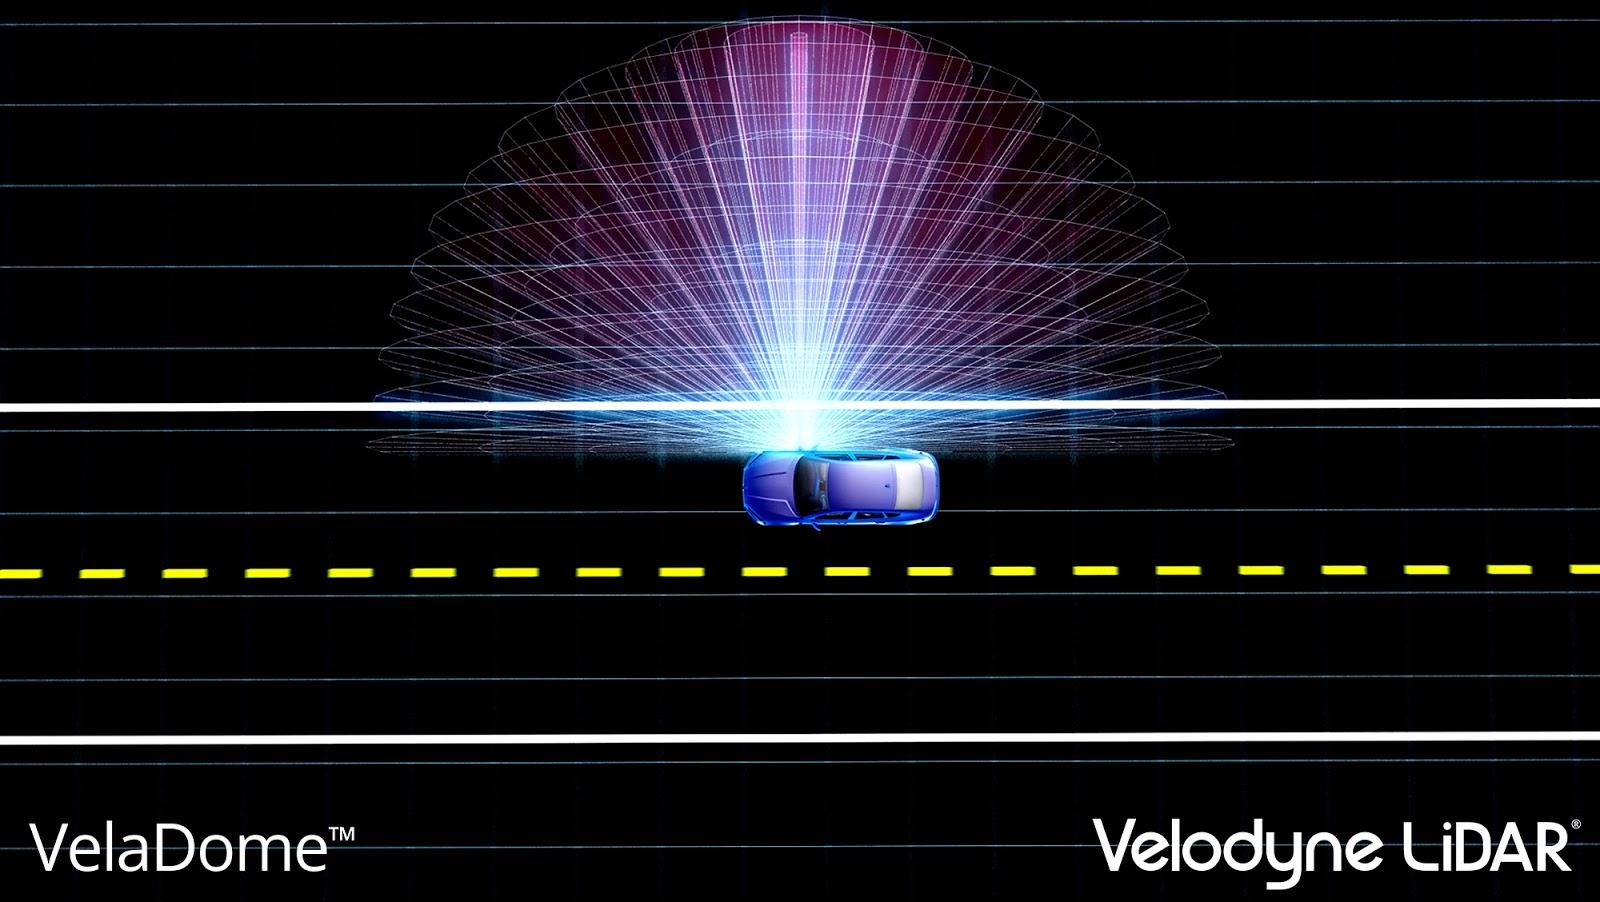 Image Sensors World: Automotive Imaging News